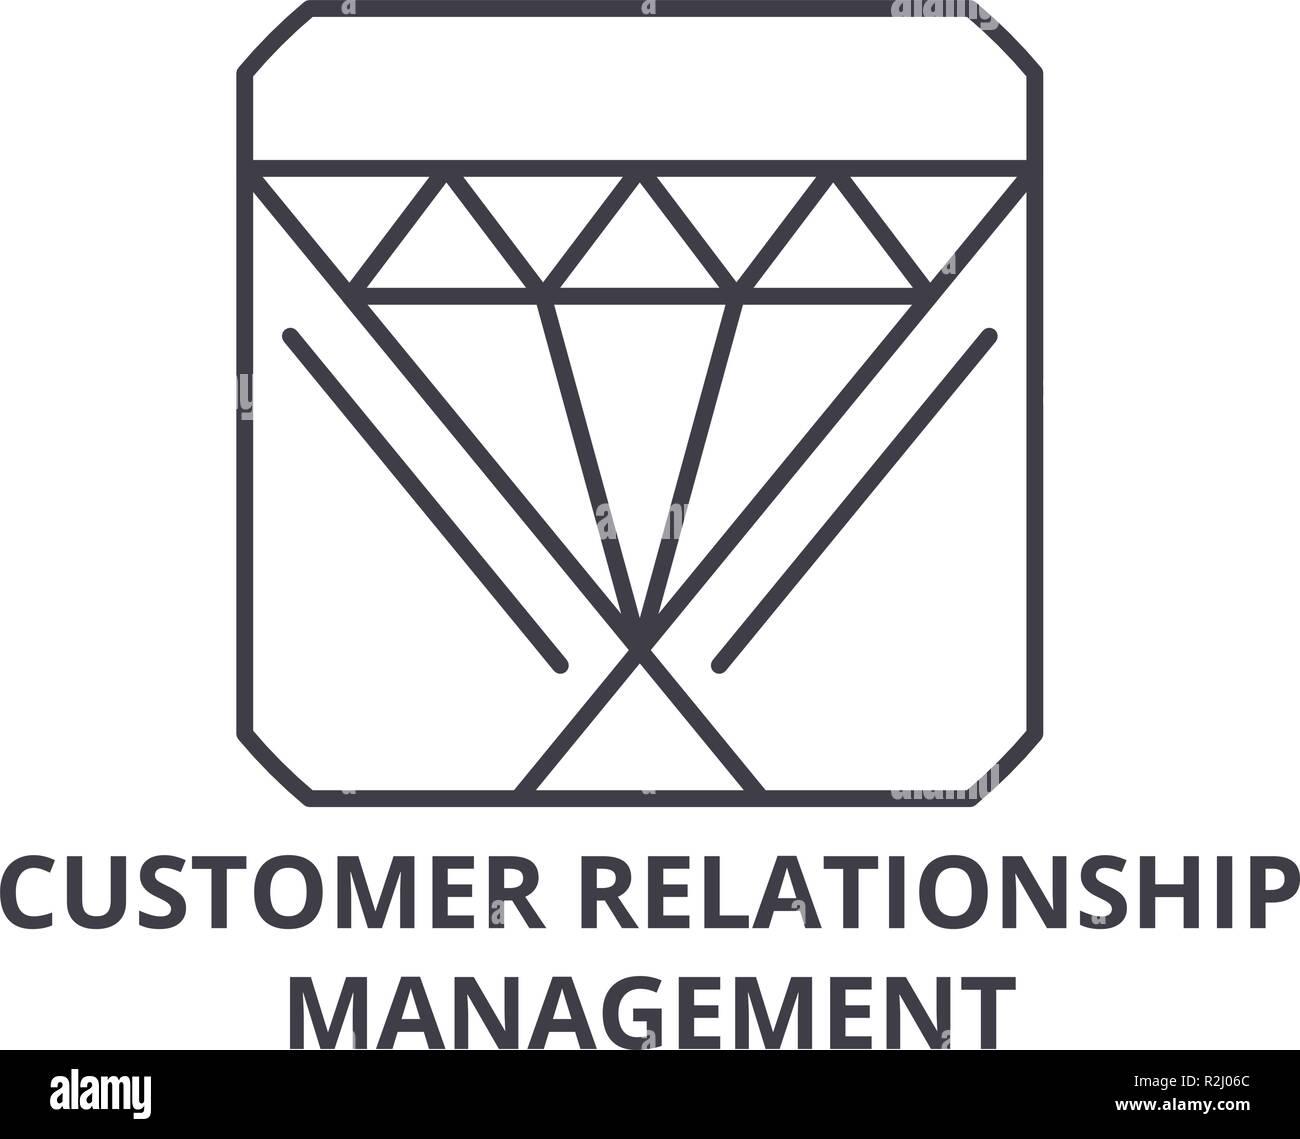 Customer relationship management line icon concept. Customer relationship management vector linear illustration, symbol, sign - Stock Image